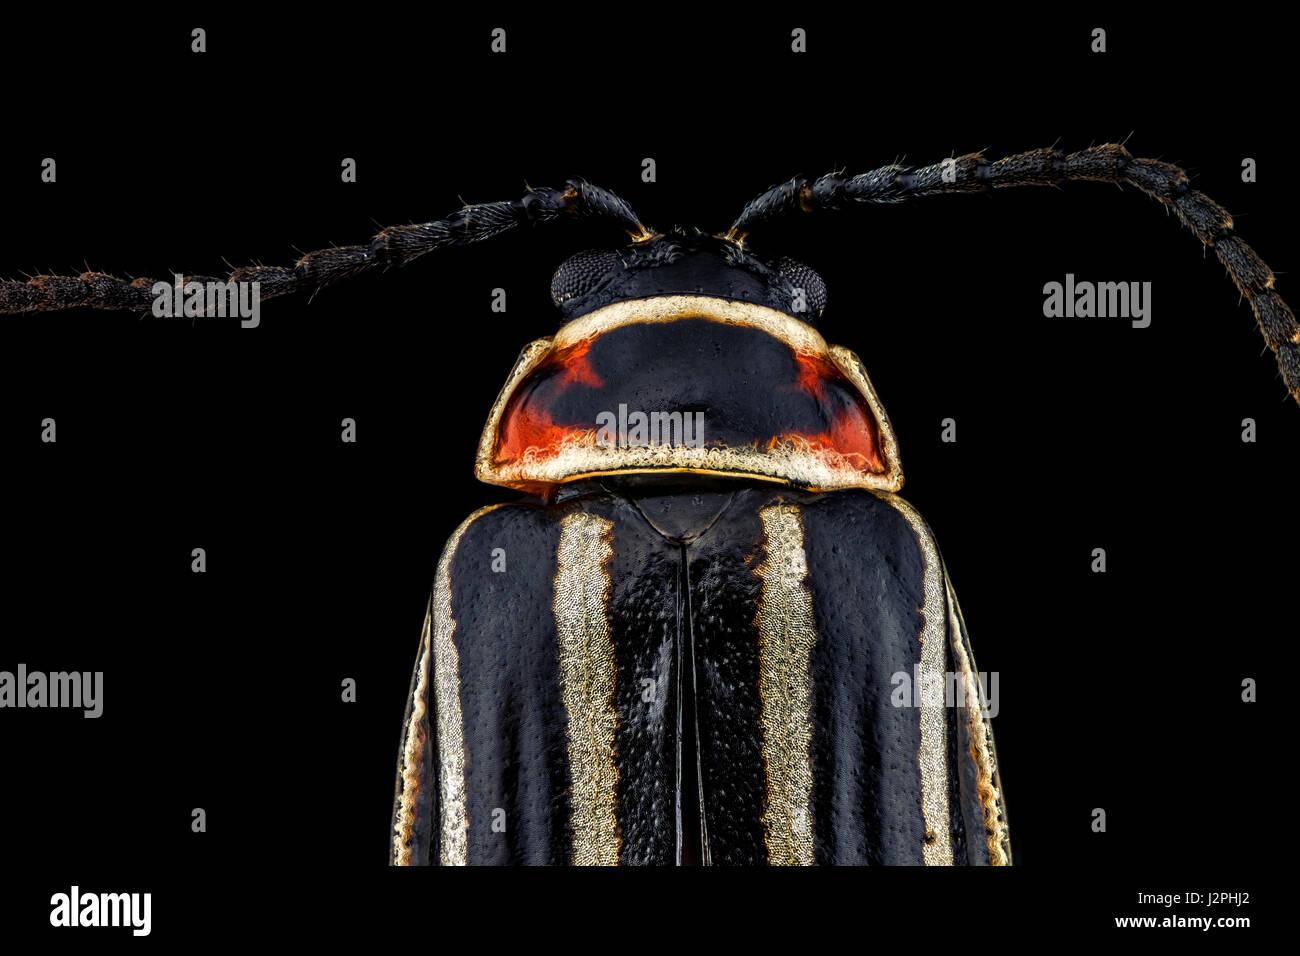 X4 Vergrößerung extreme Makro ein Ten-Lined Juni Käfer. Stockbild